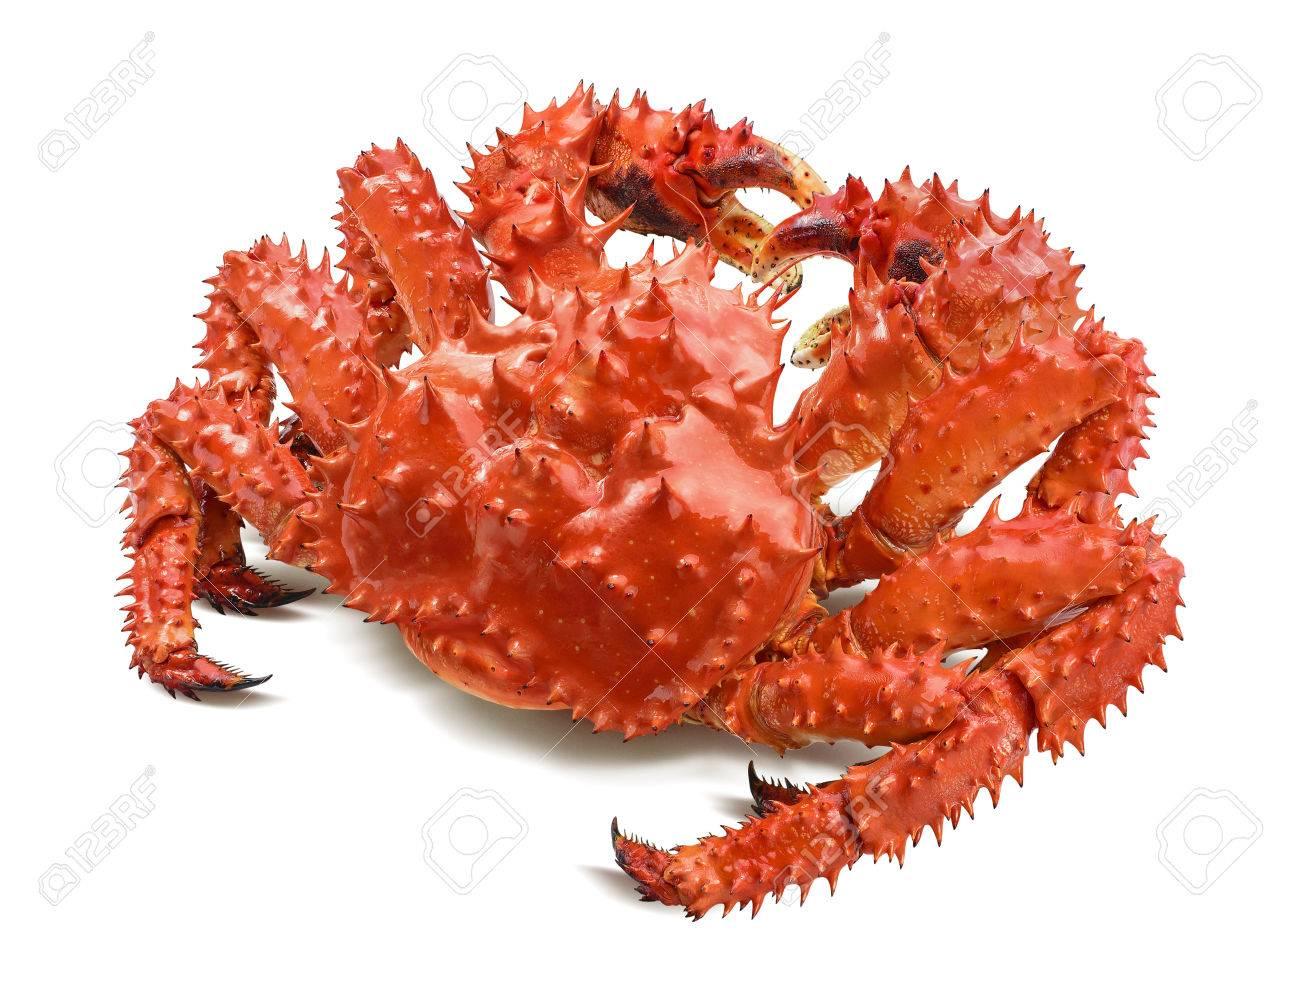 Kamchatka king crab isolated on white background, back view - 83981199